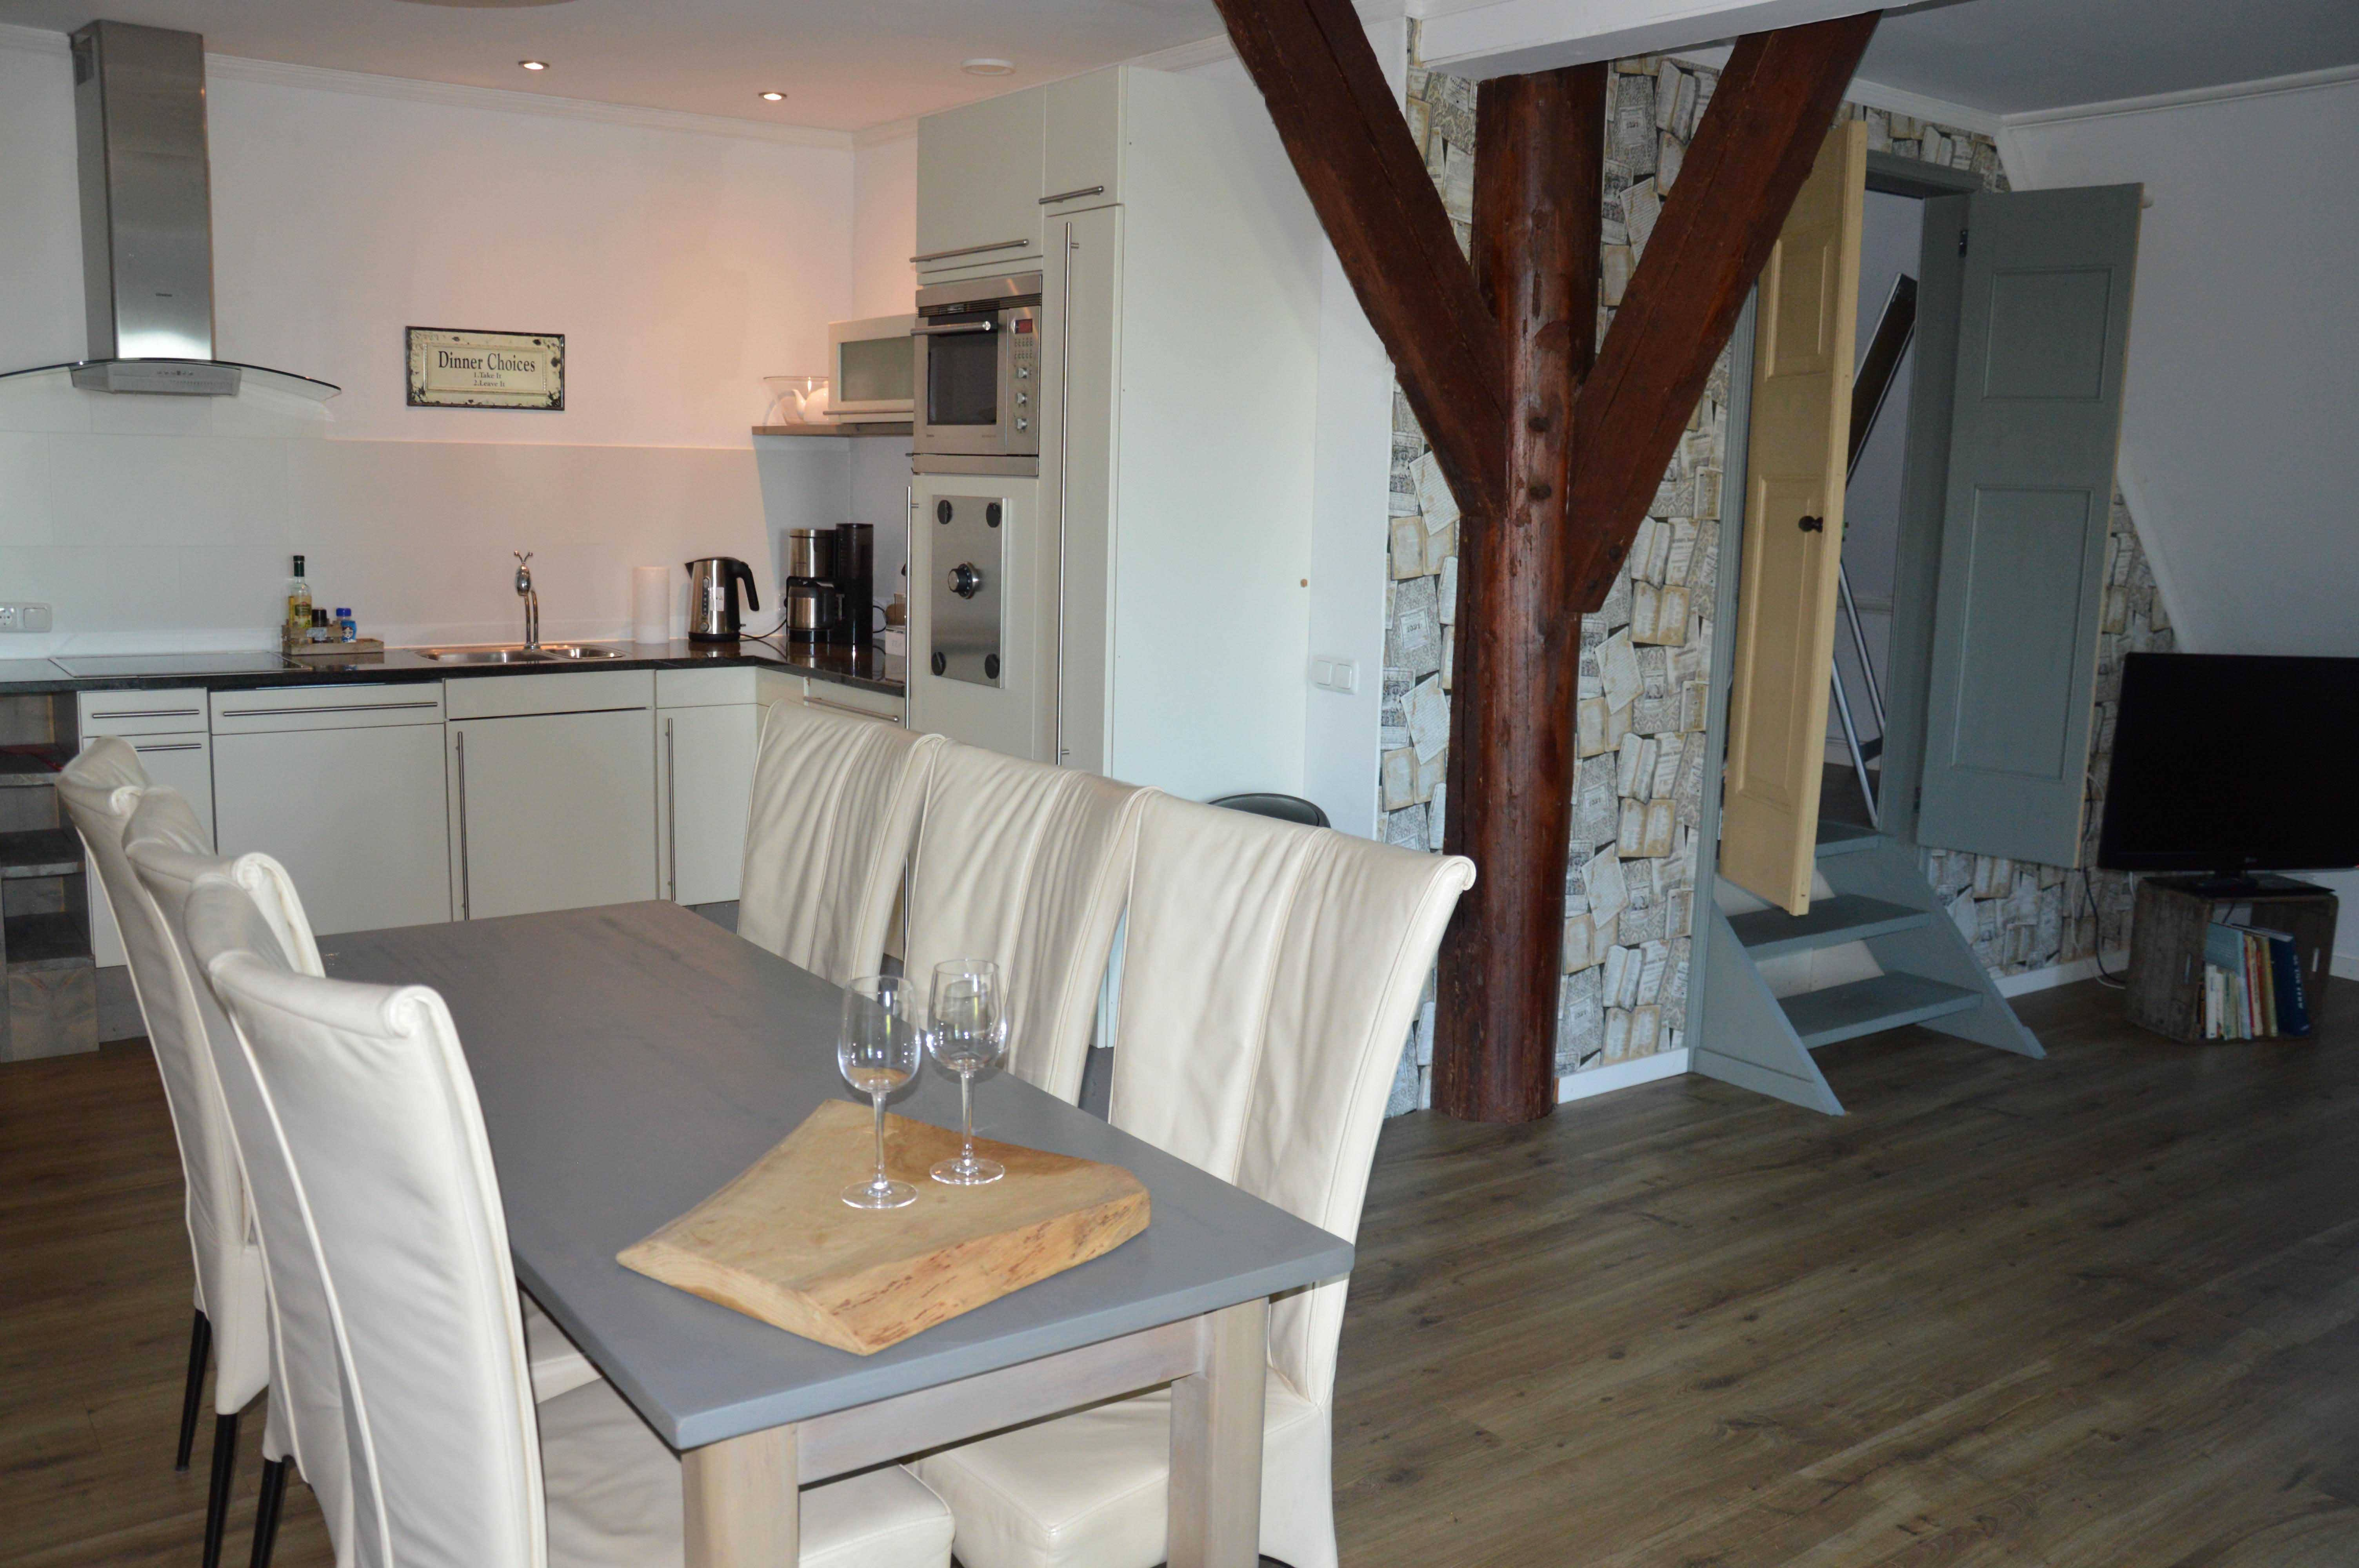 Lyklamastate_Bed_&_Breakfast_Hotel_Overnachten_Boerderij_Friesland_Noord_Nederland_Wellness_Appartement